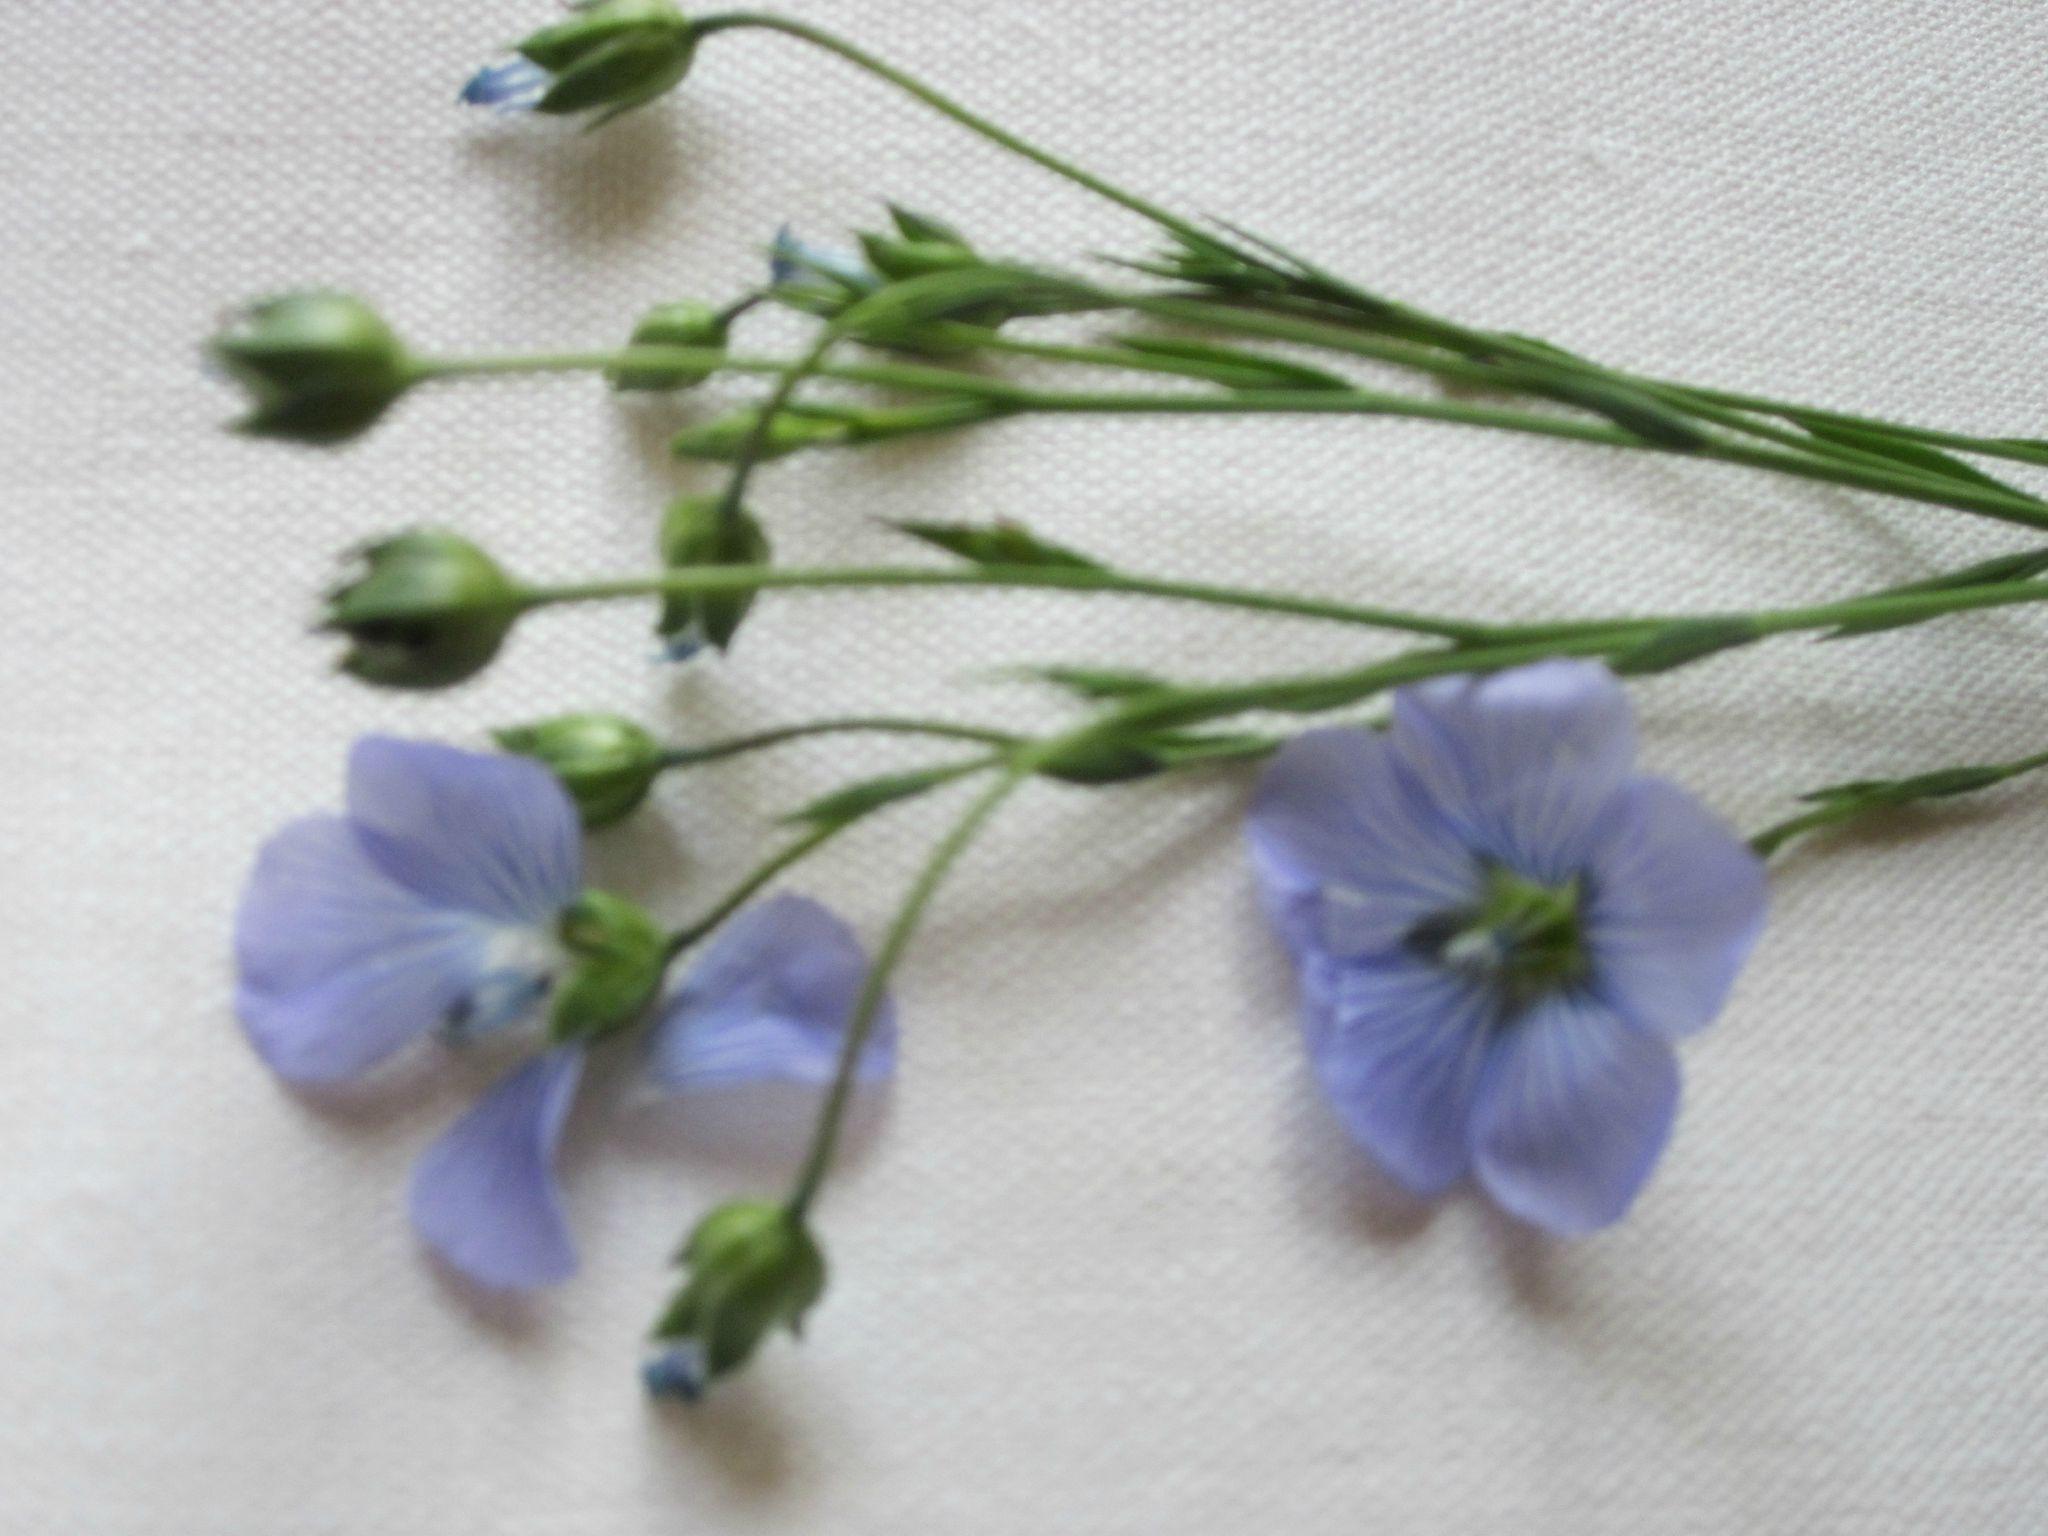 Couture, lin, petites fleurs, pour joli edredon